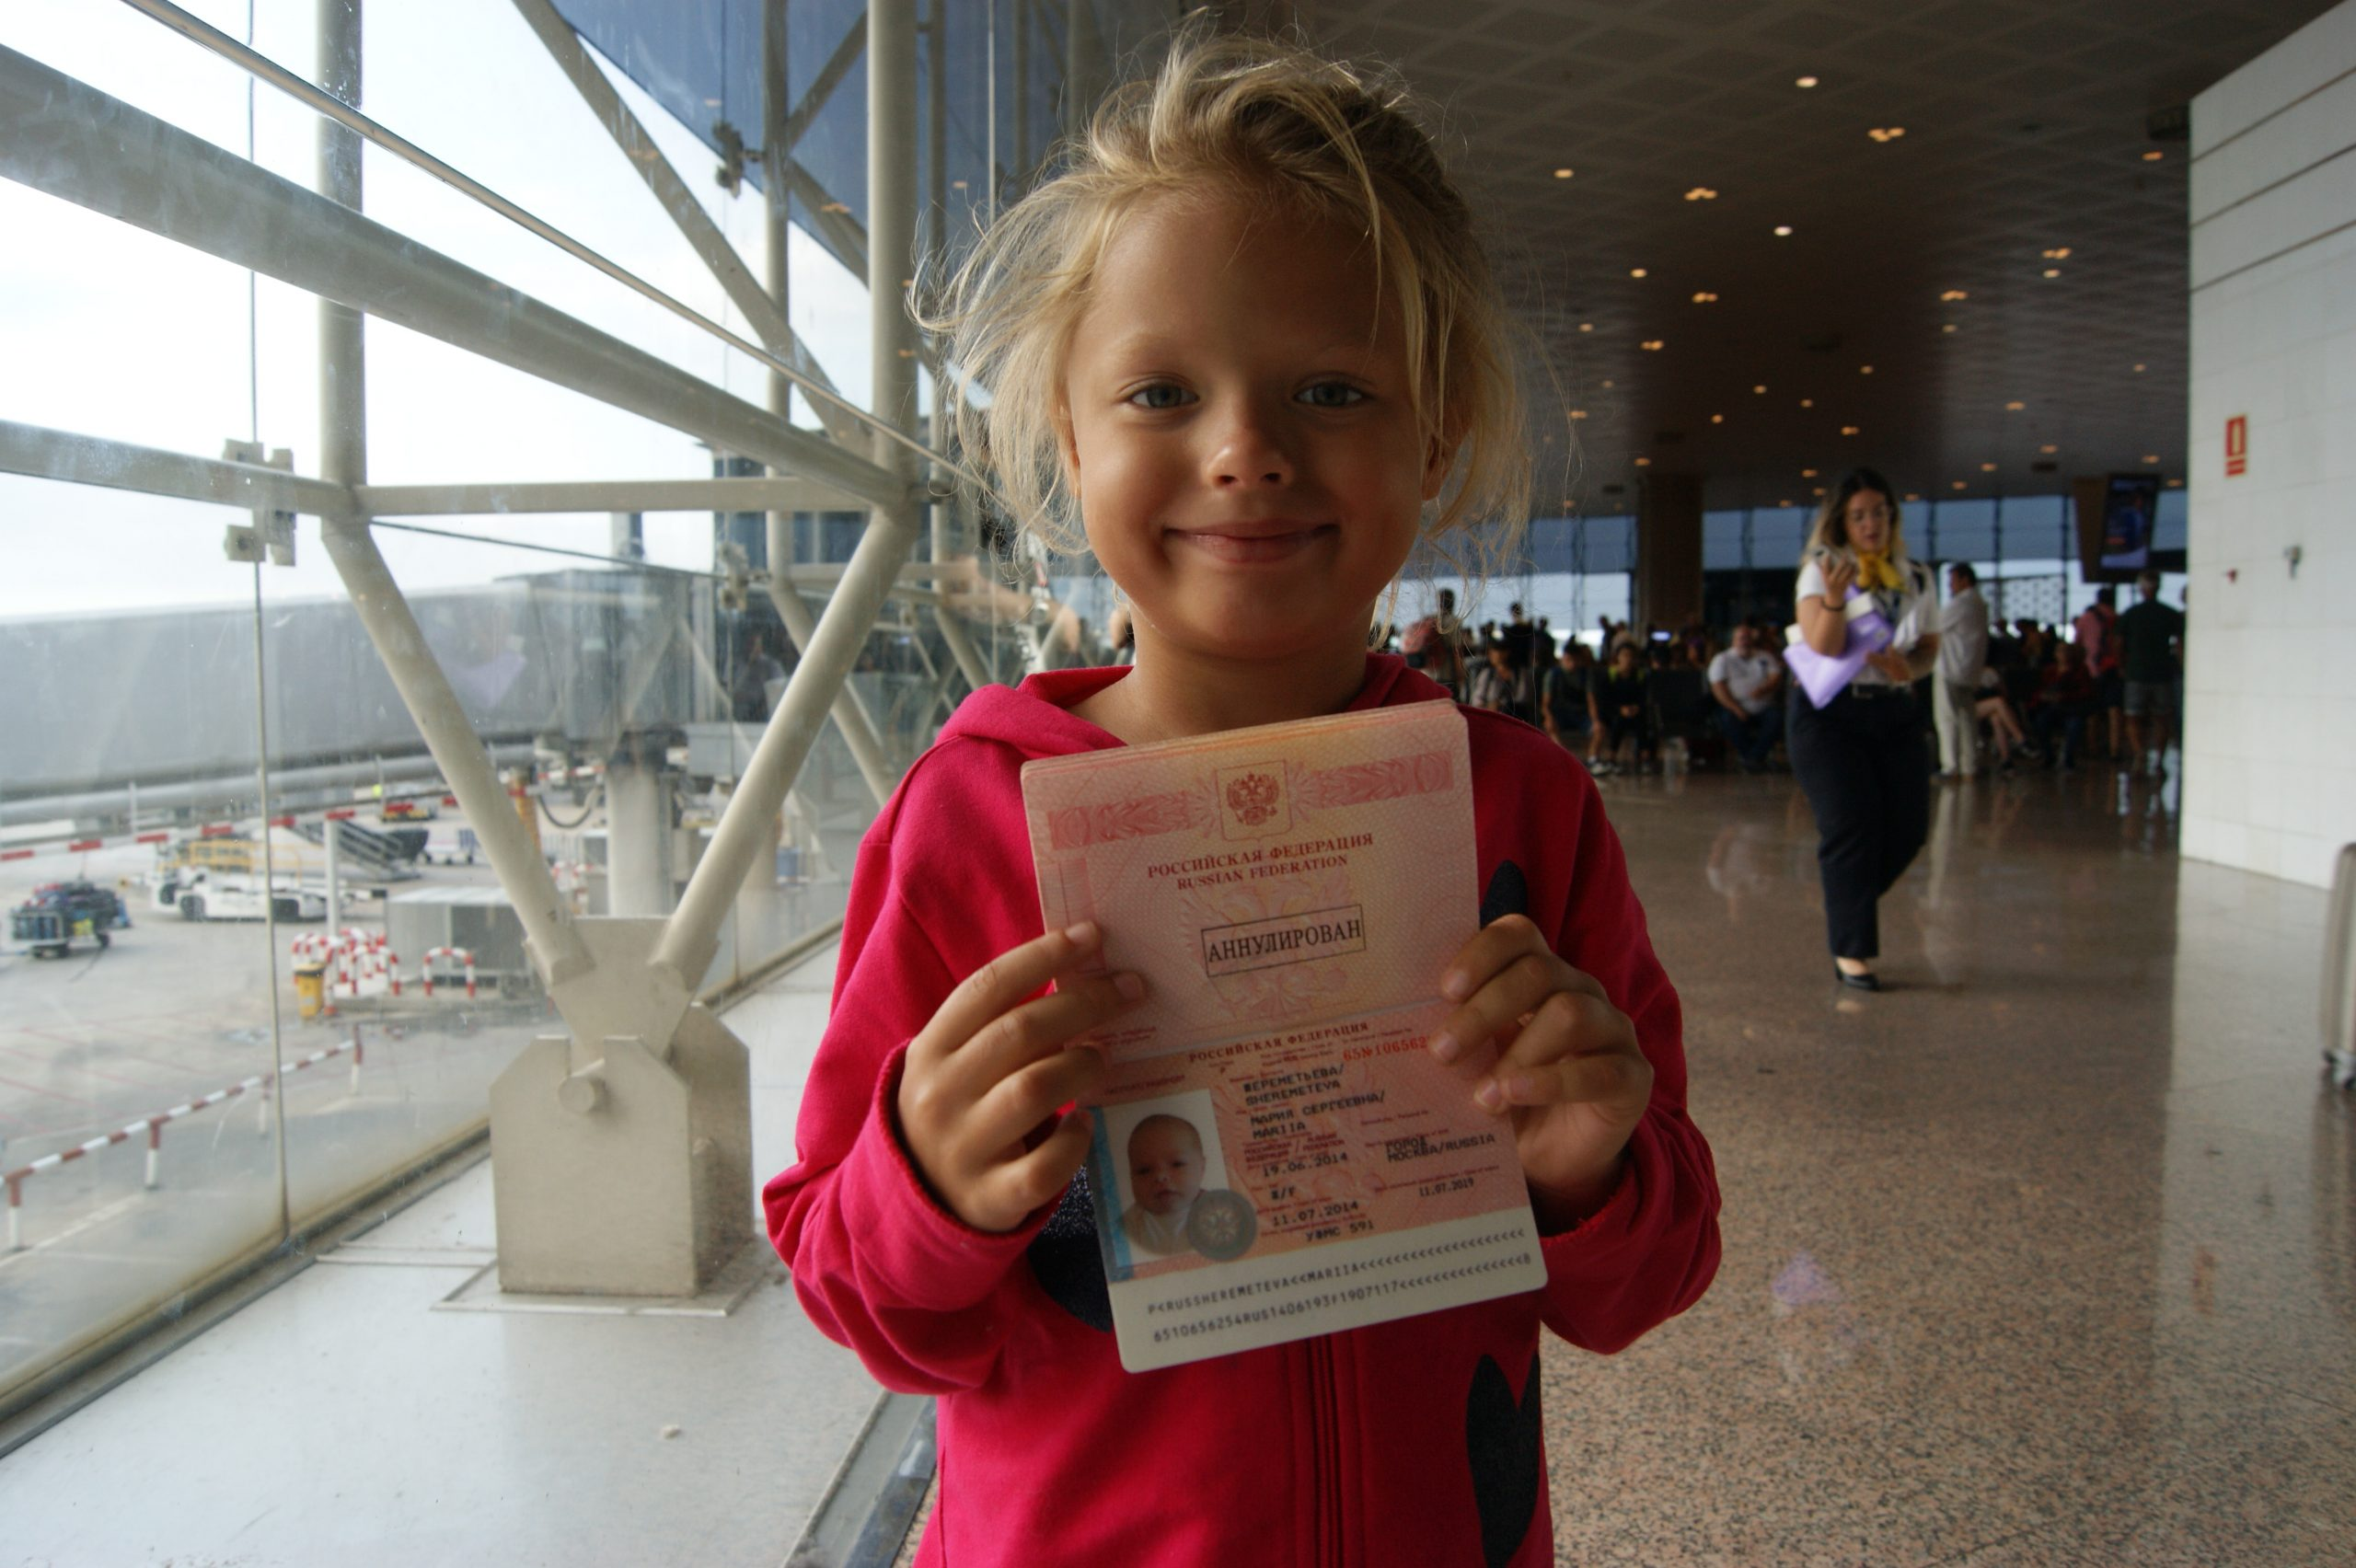 Разрешение на выезд ребенка за границу и тонкости оформления